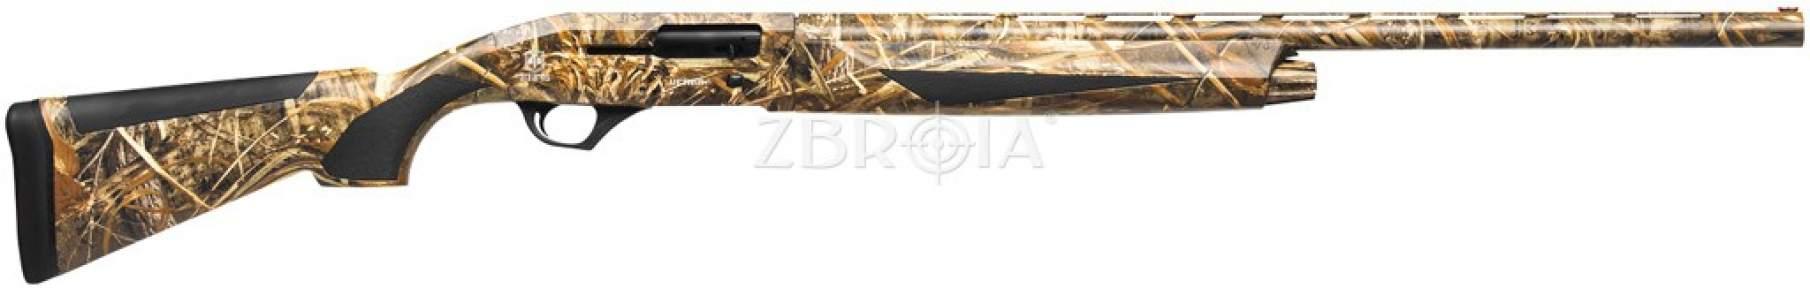 Ружье Ata Arms Venza MAX5 кал. 12/76